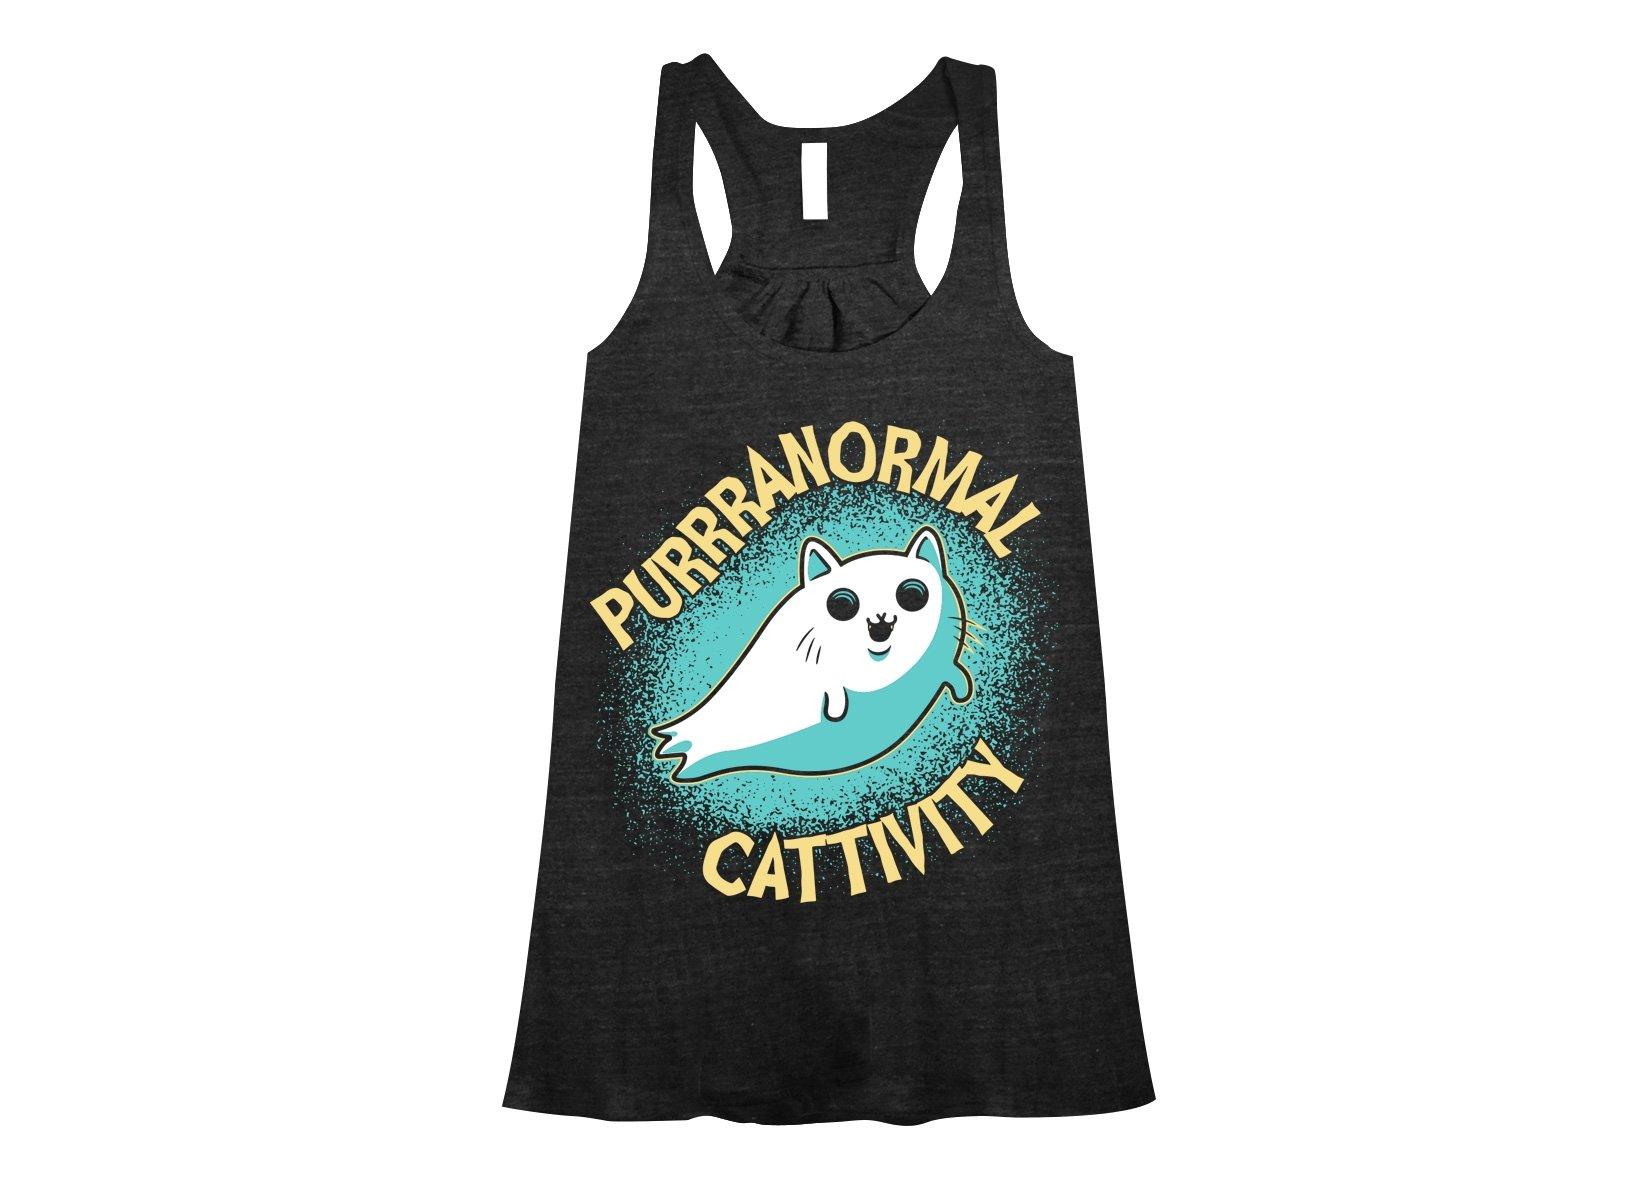 Purrranormal Cattivity on Womens Tanks T-Shirt